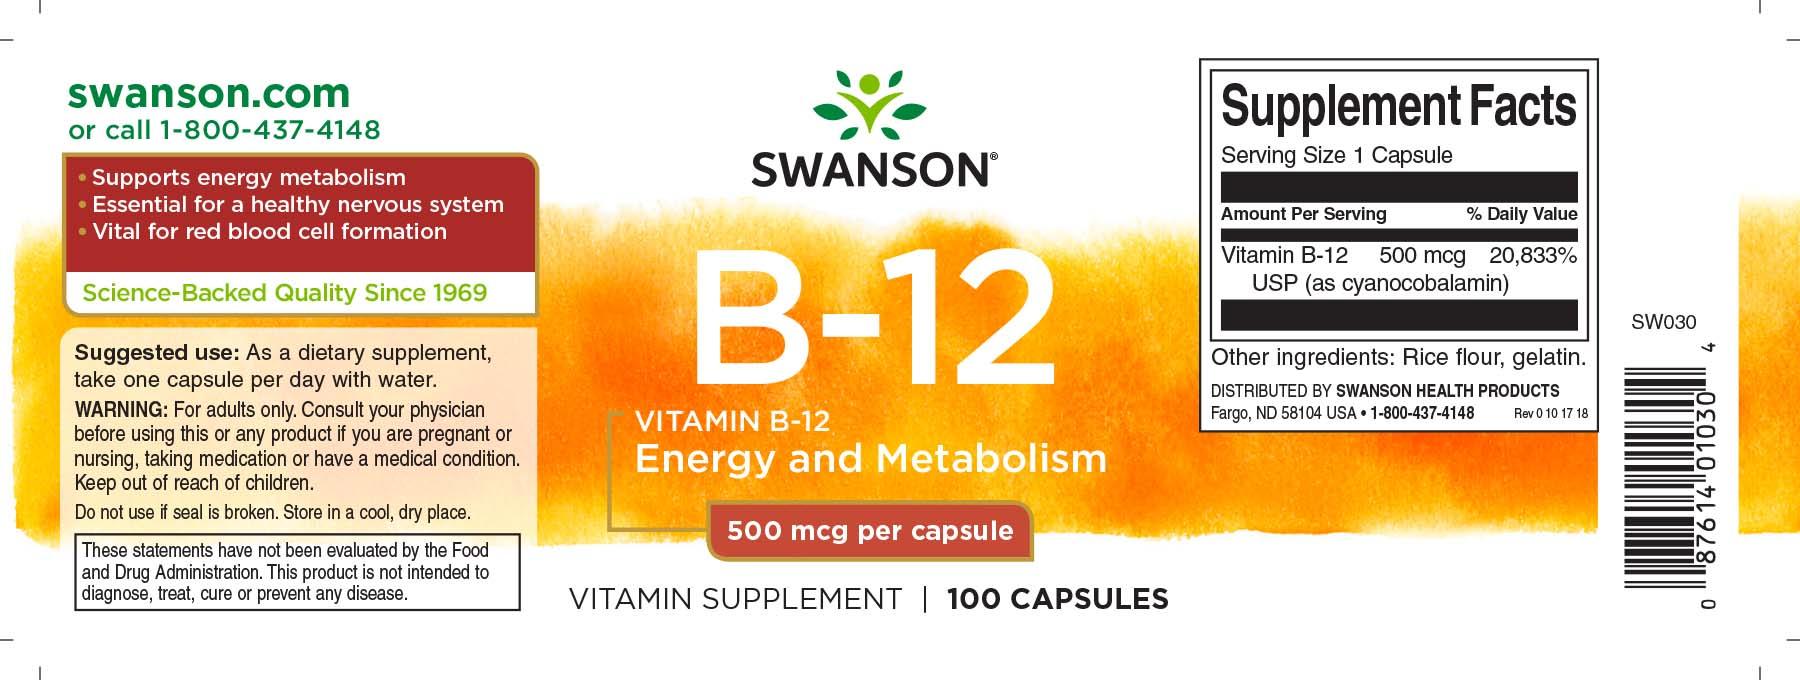 European Vitamin Supplements